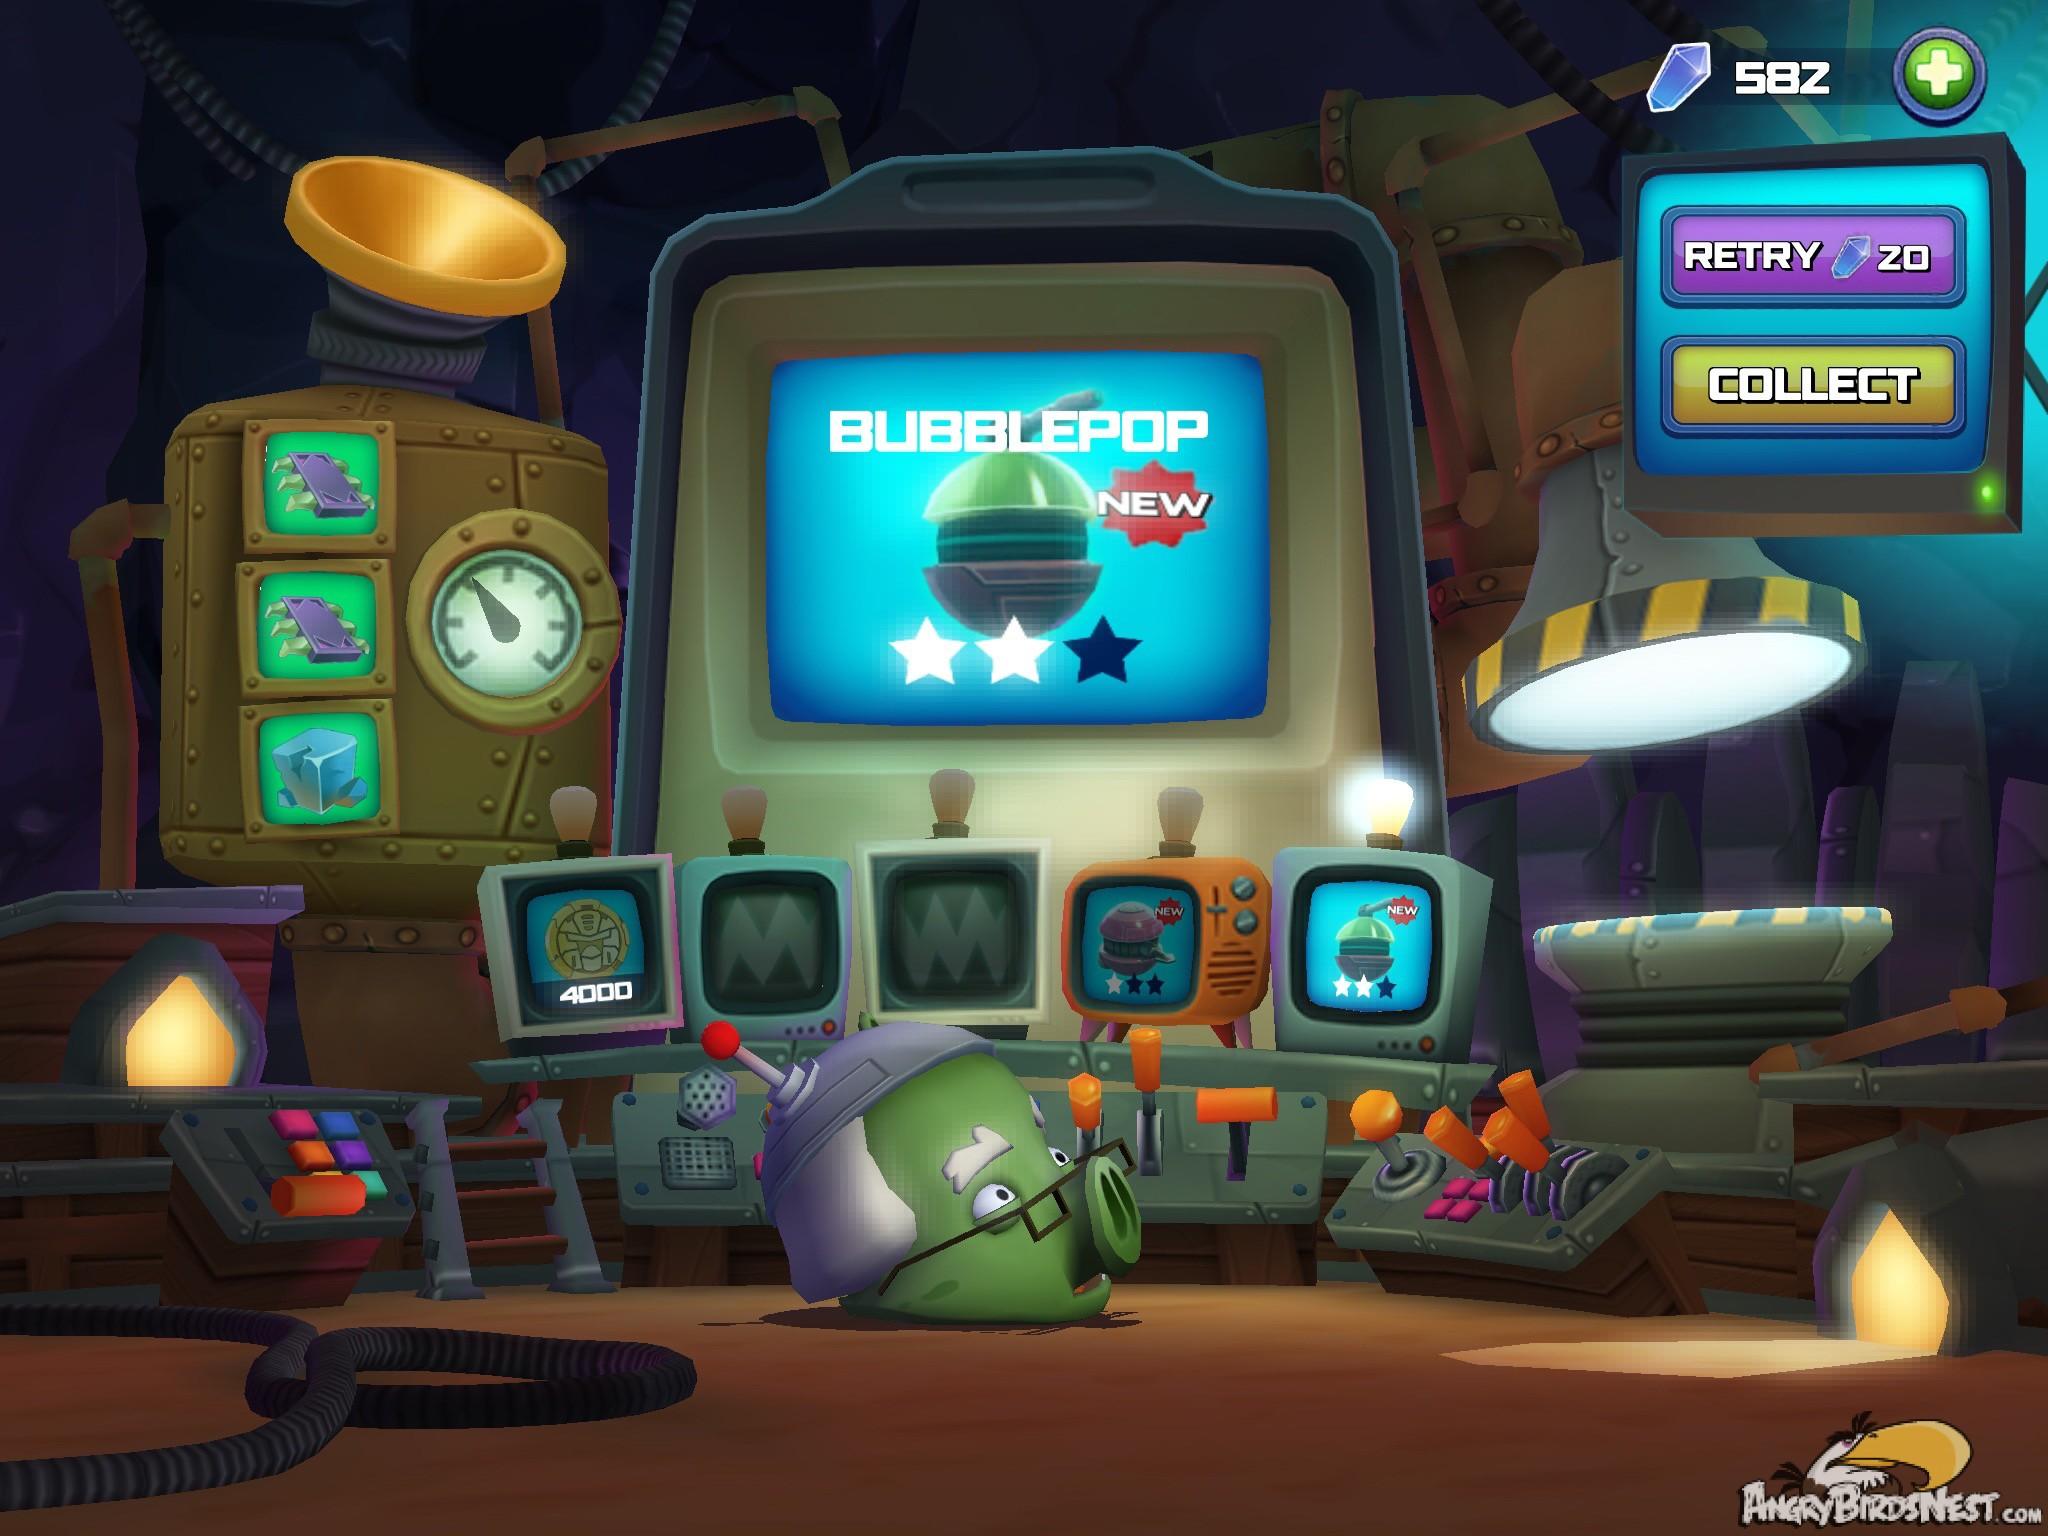 File:Angry-Birds-Transformers-Professor-Pigs-Laboratory-Screen-310x233.jpg